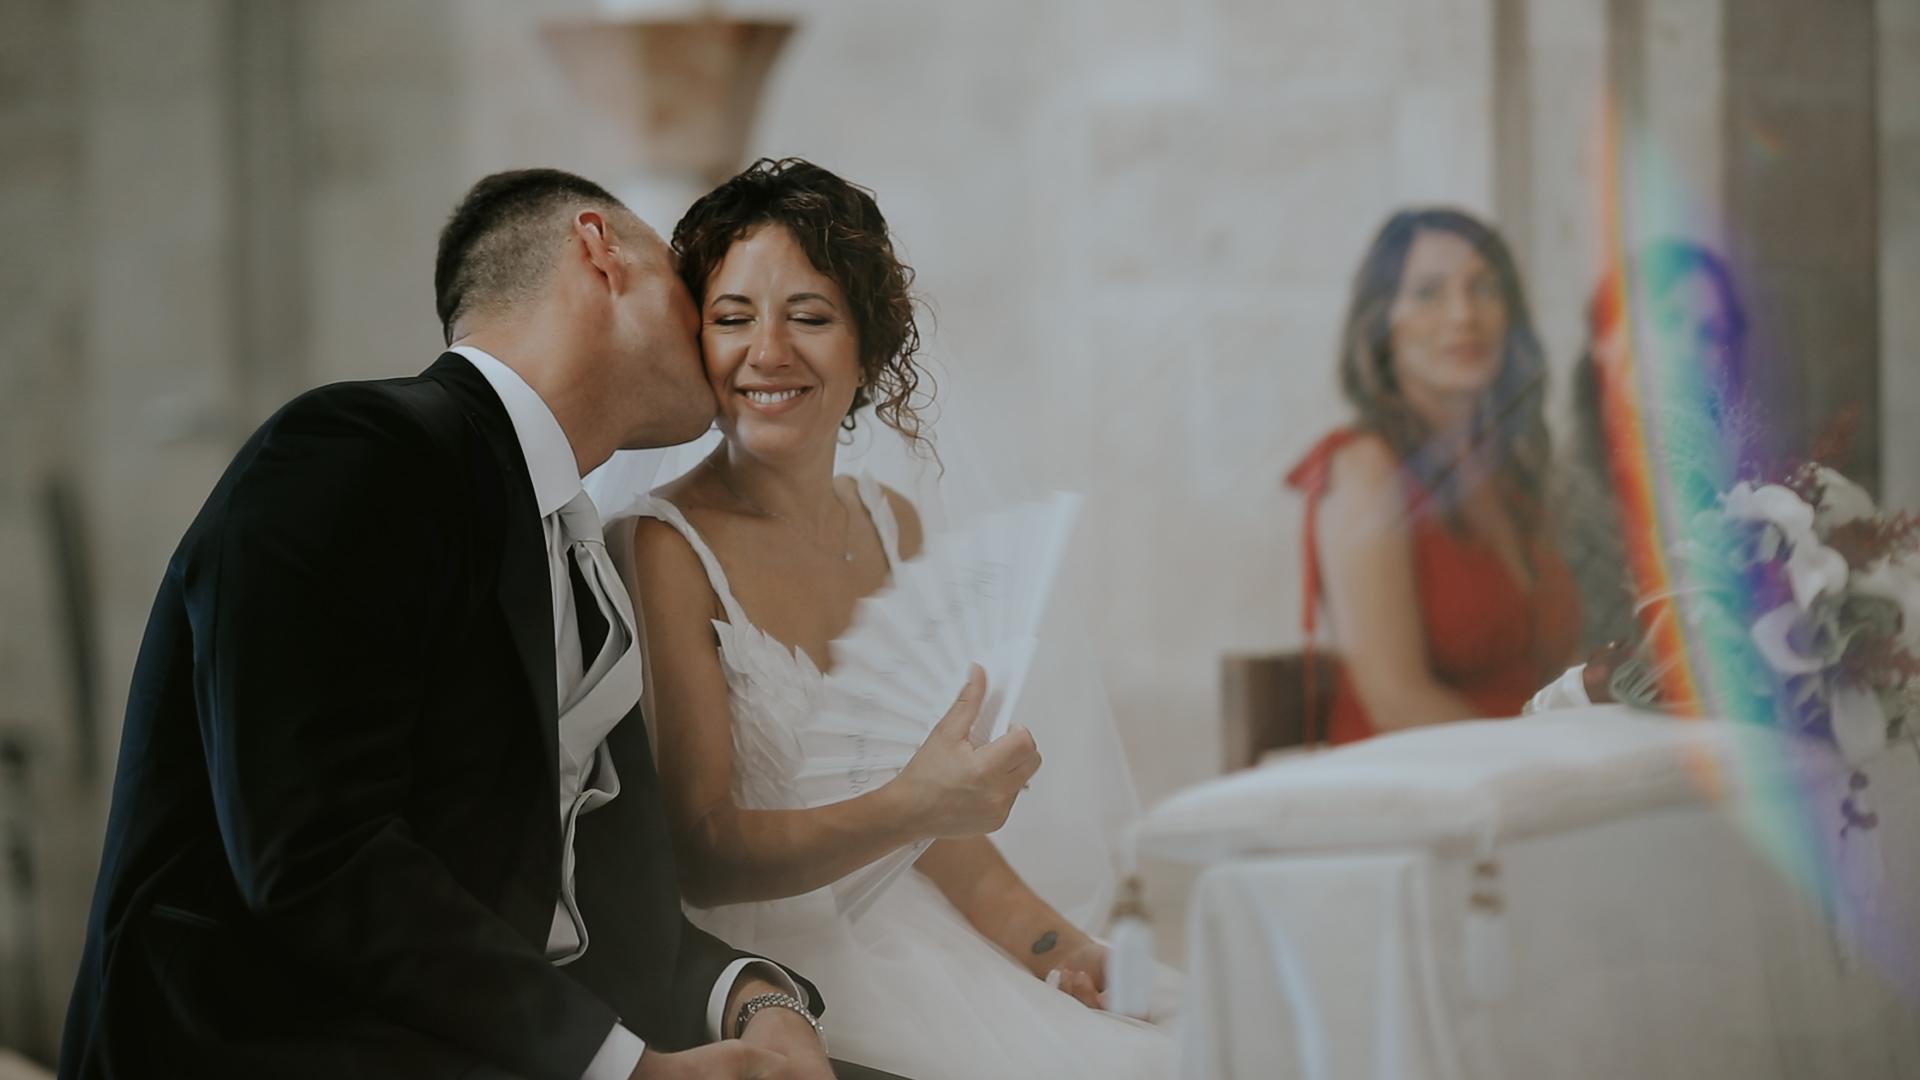 FILM.00_02_16_02.Immagine006 Matrimonio a Termoli